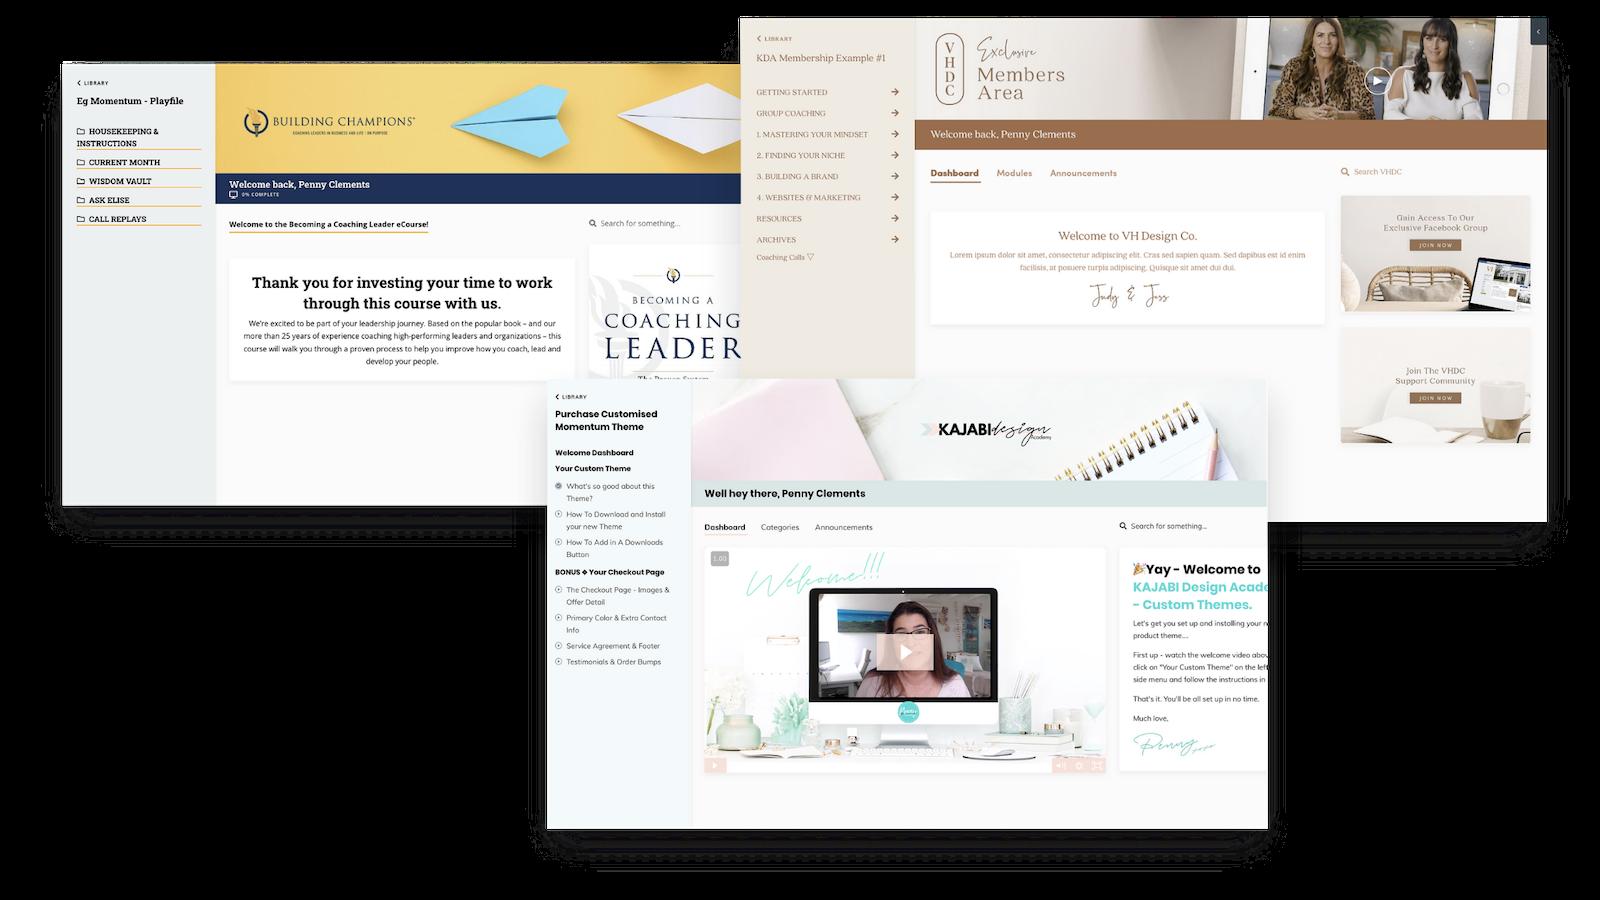 Kajabi Product Themes for Courses and Memberships